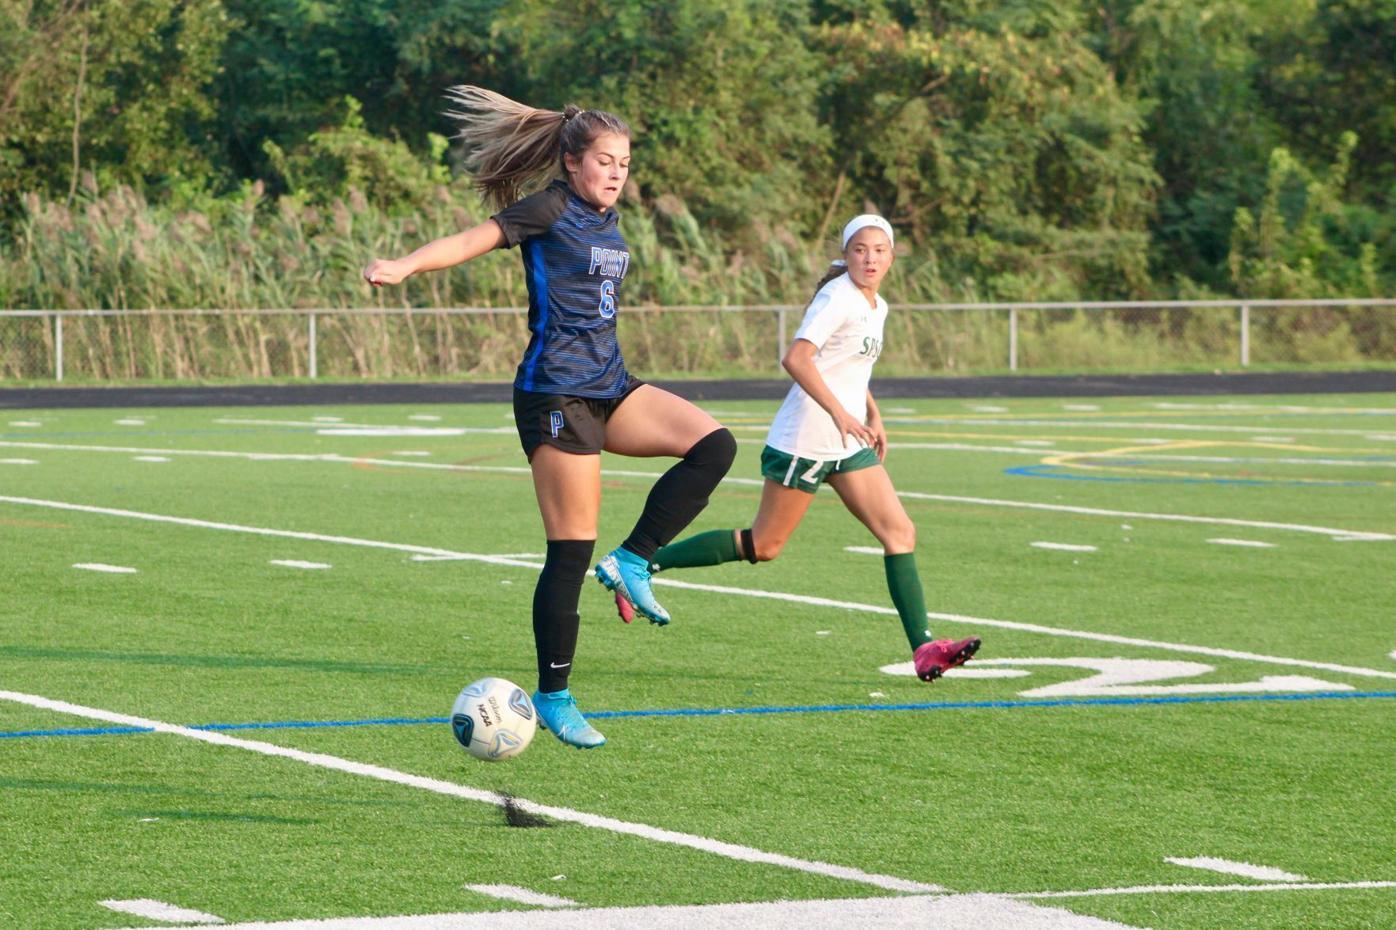 Gators beat Pointers in girls' soccer